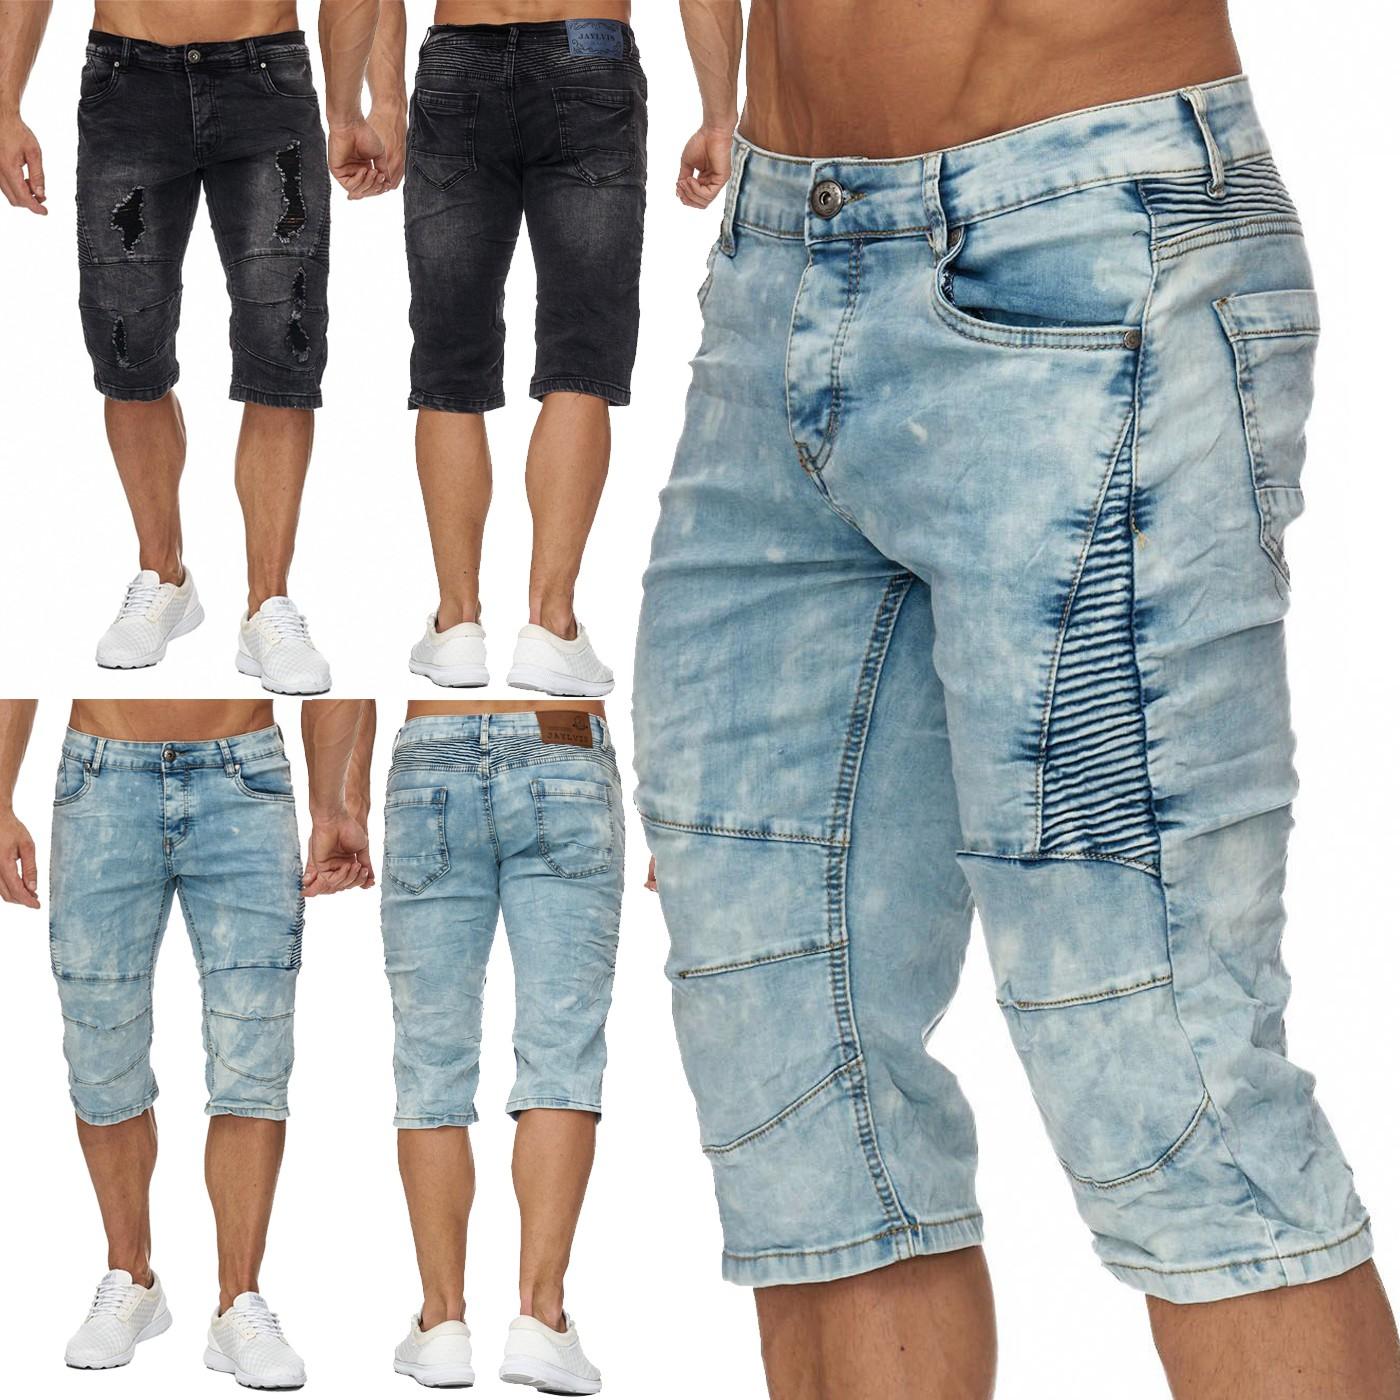 d58d539589c8 Herren Jeans Shorts Hose Stonewashed Denim Biker (2 Farben Styles) Bermuda  Neu - Nr 1942